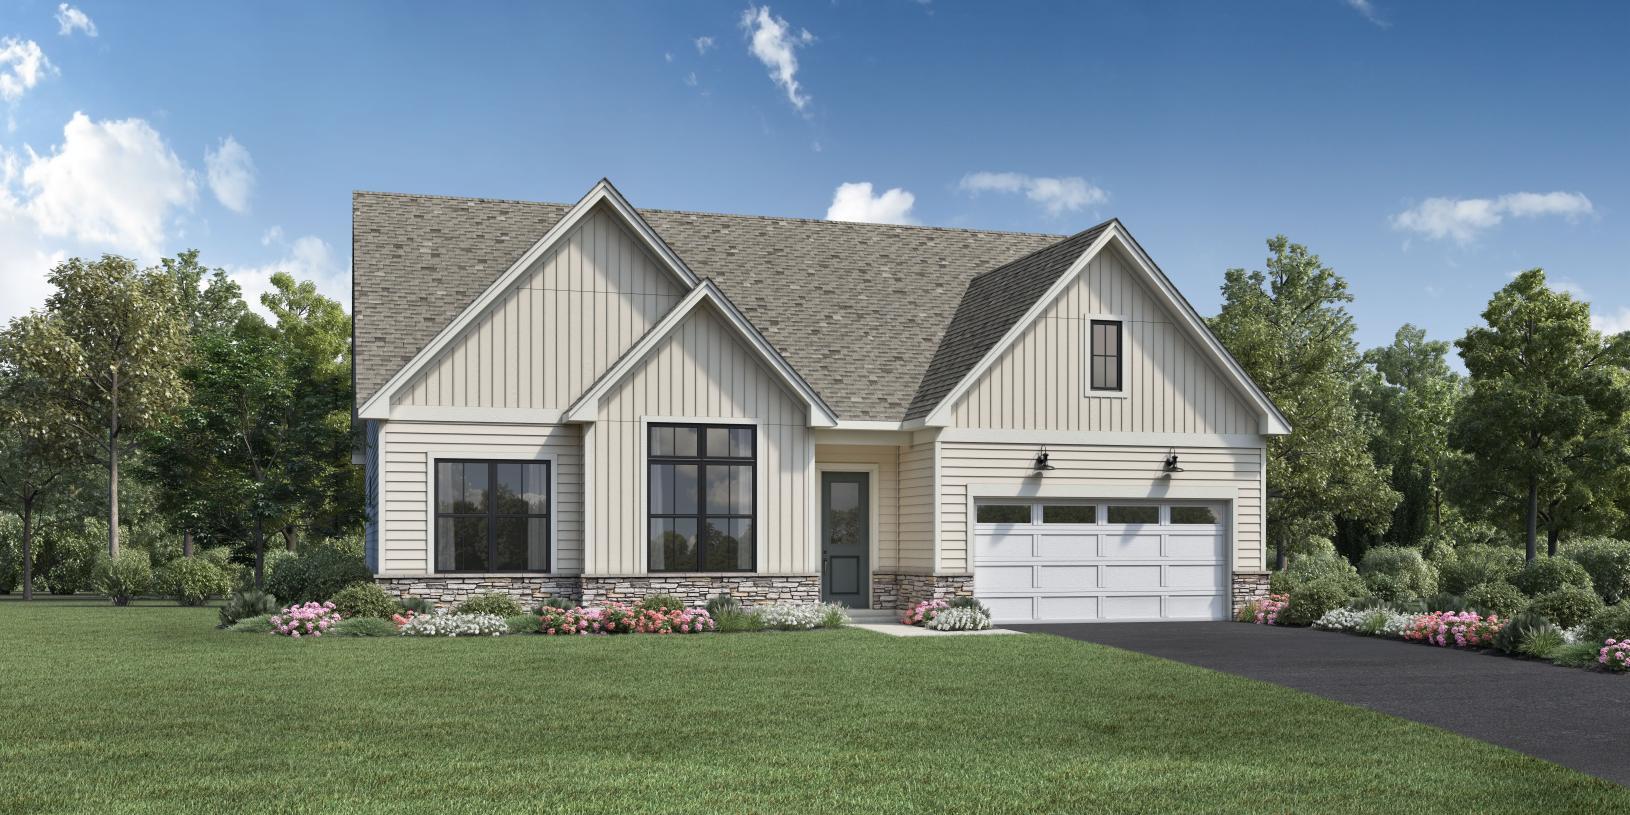 Dansboro - Modern Farmhouse